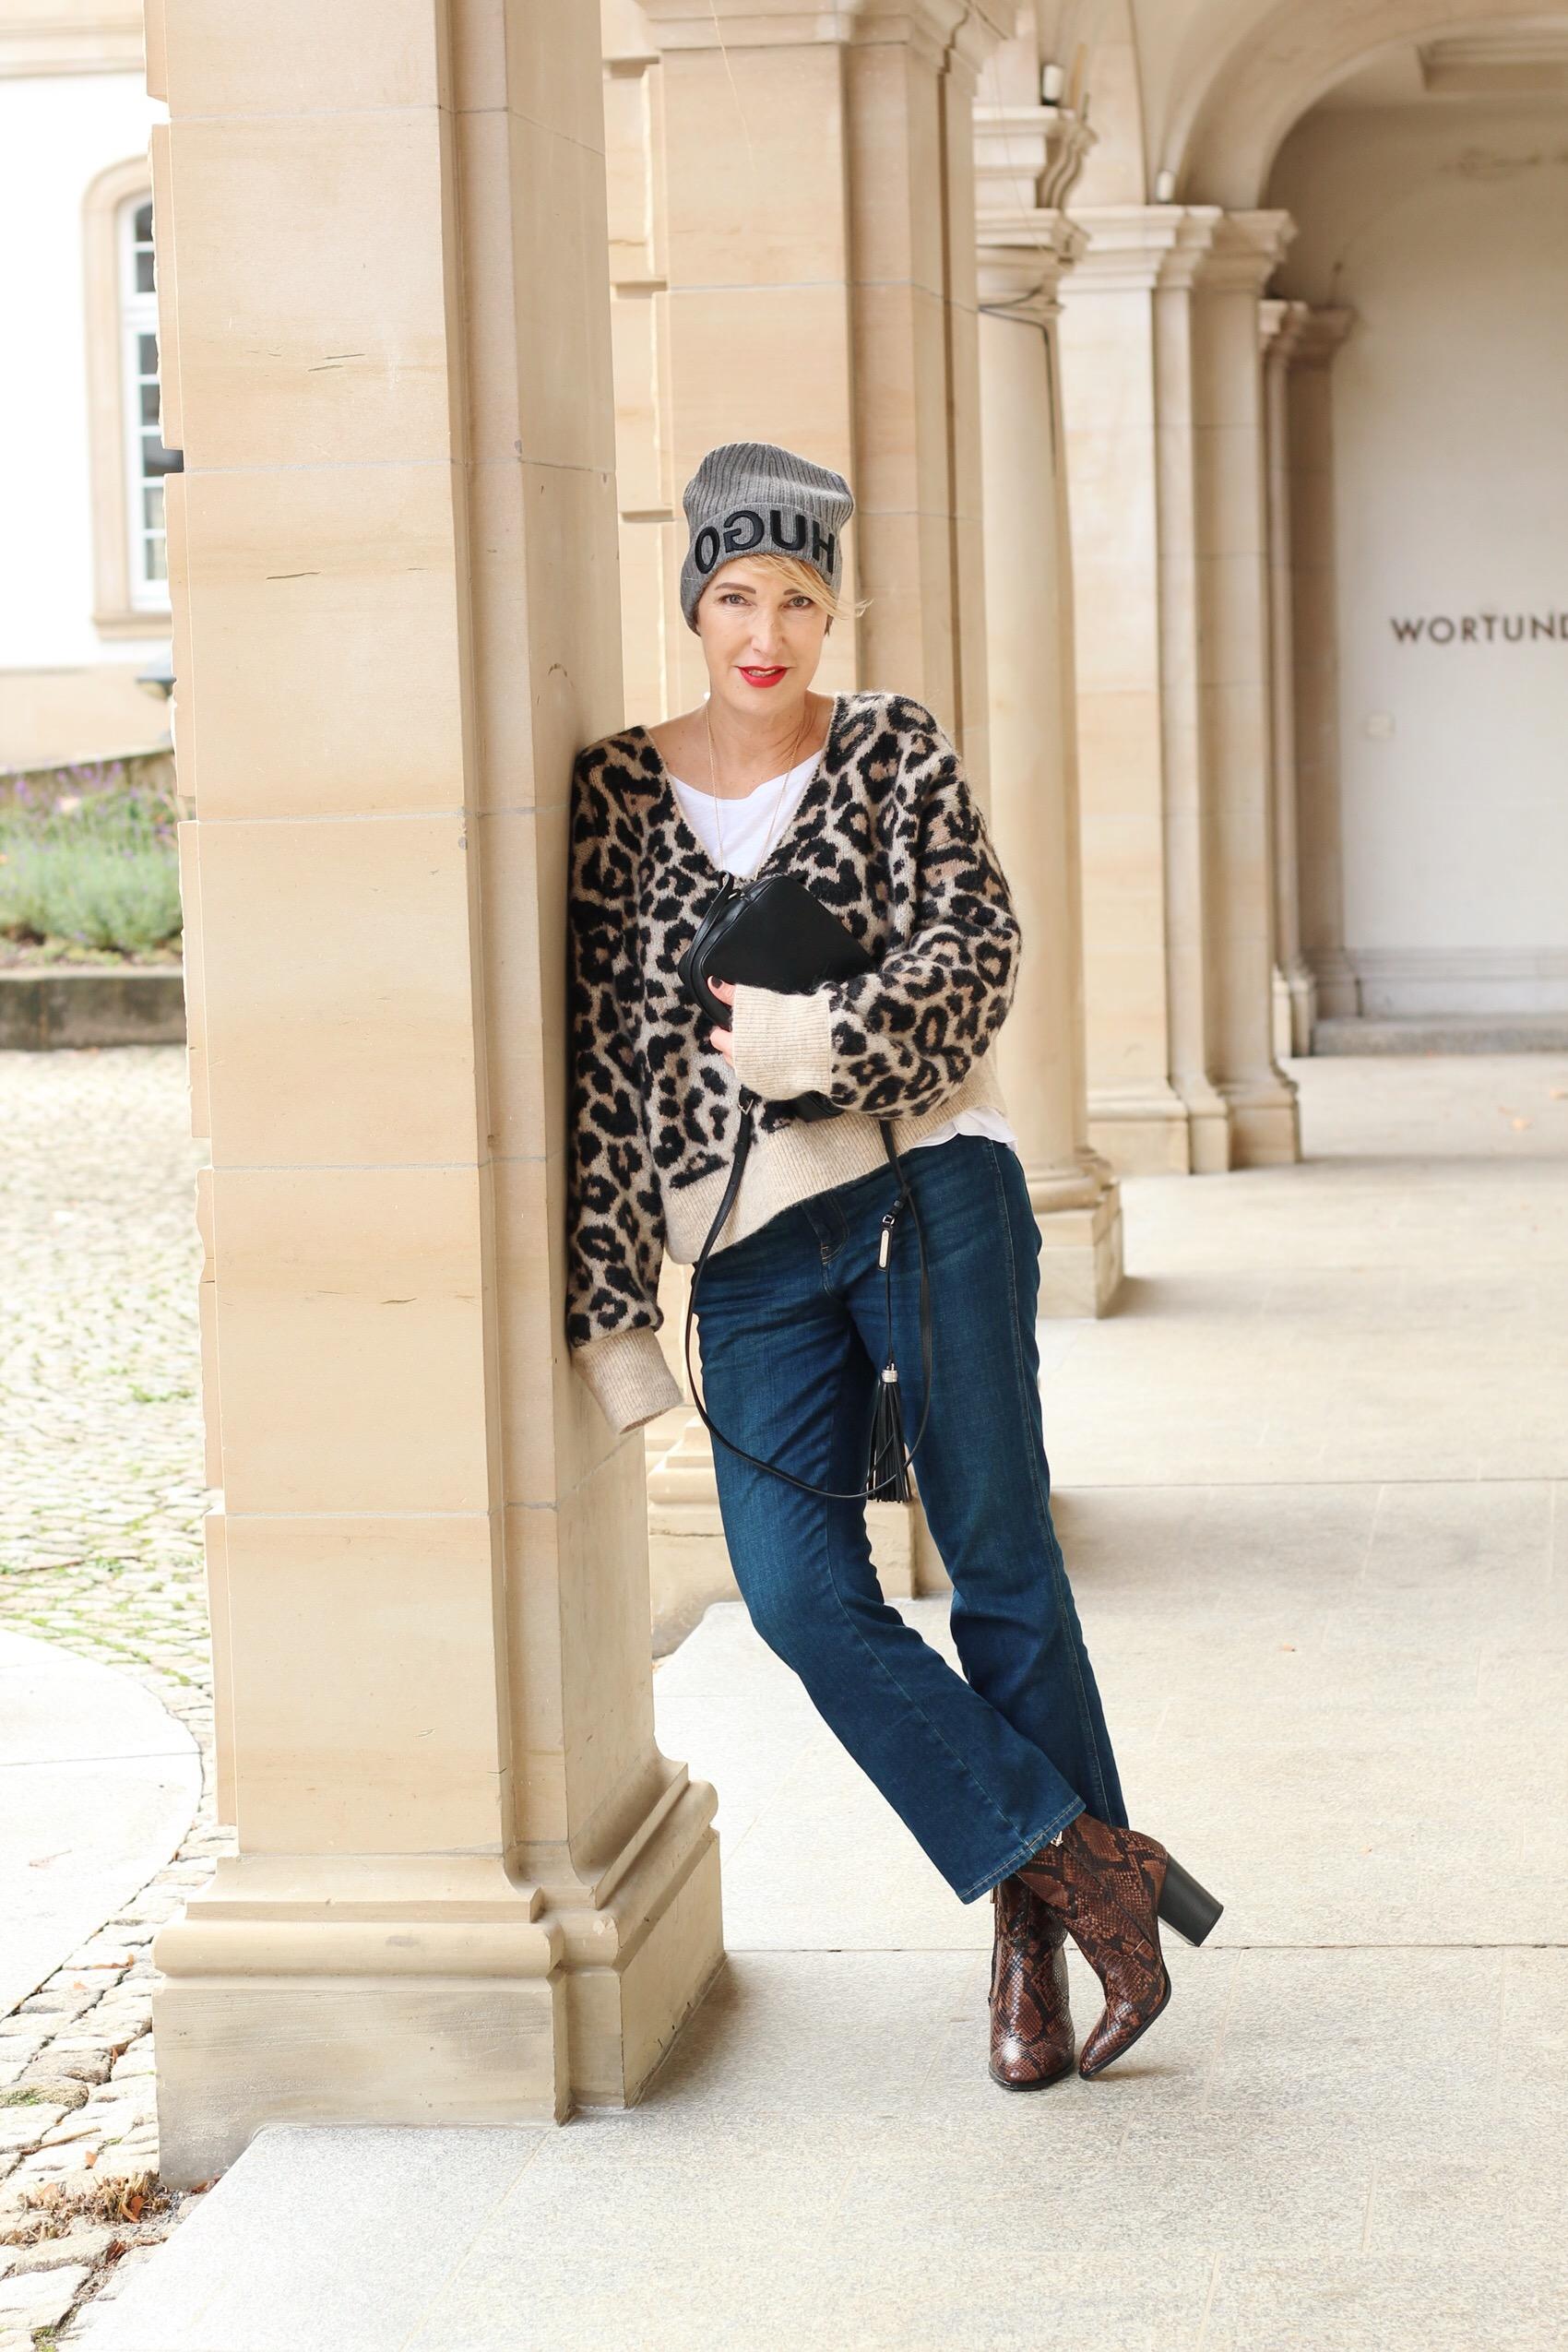 glamupyourlifestyle leoparden-muster leo-muster animal-print schlangenmuster ü-40-blog ü-50-blog ue-40-blog